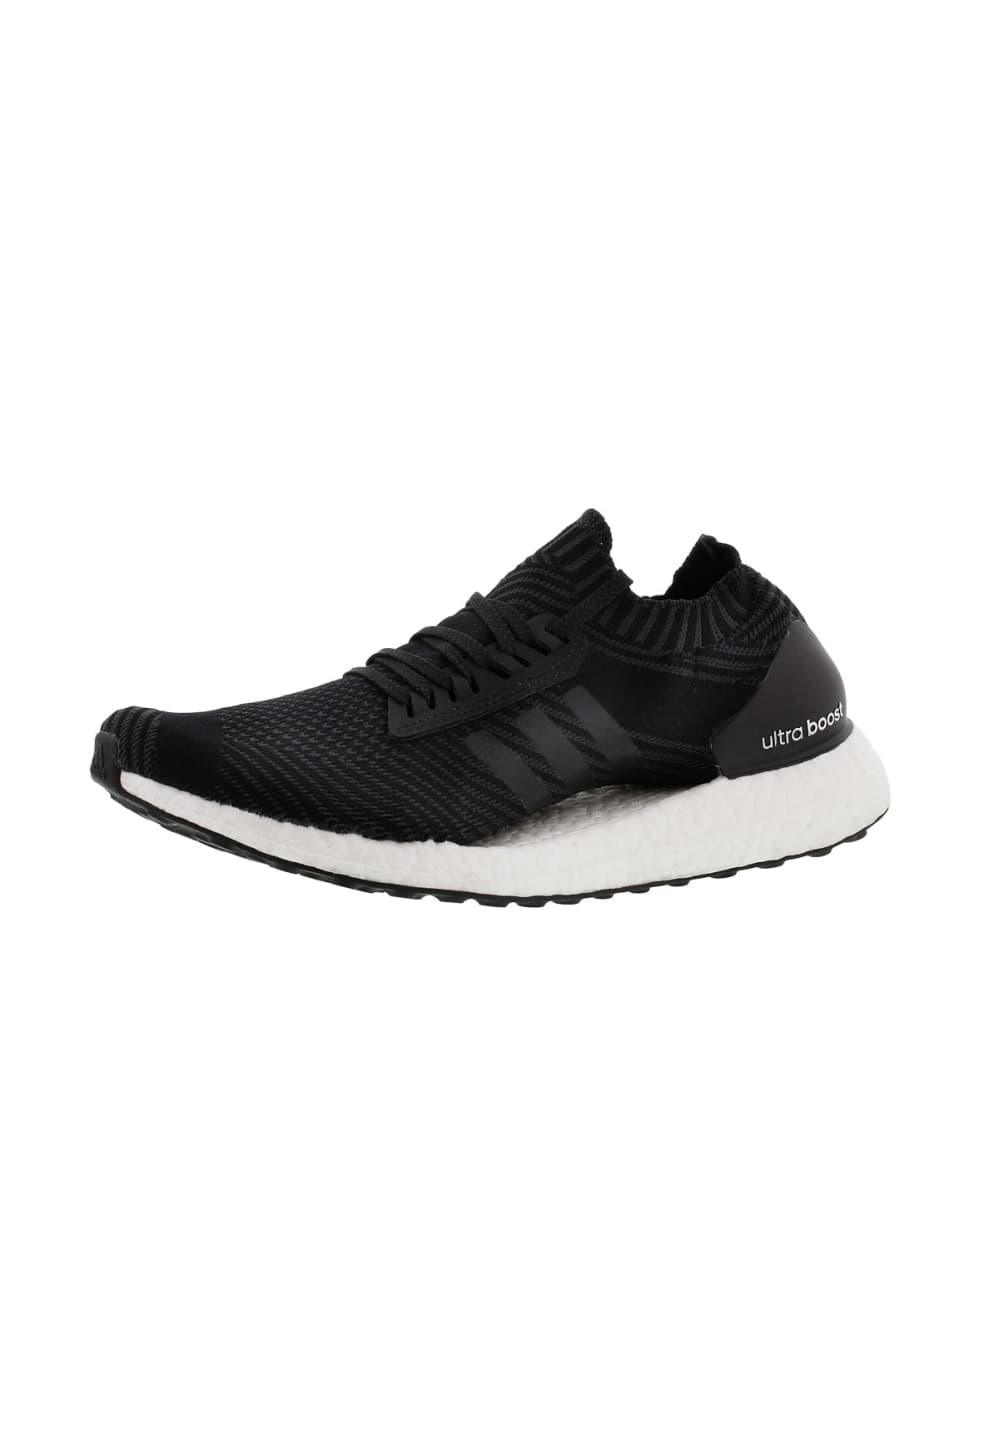 adidas Ultra Boost X Damen schwarz